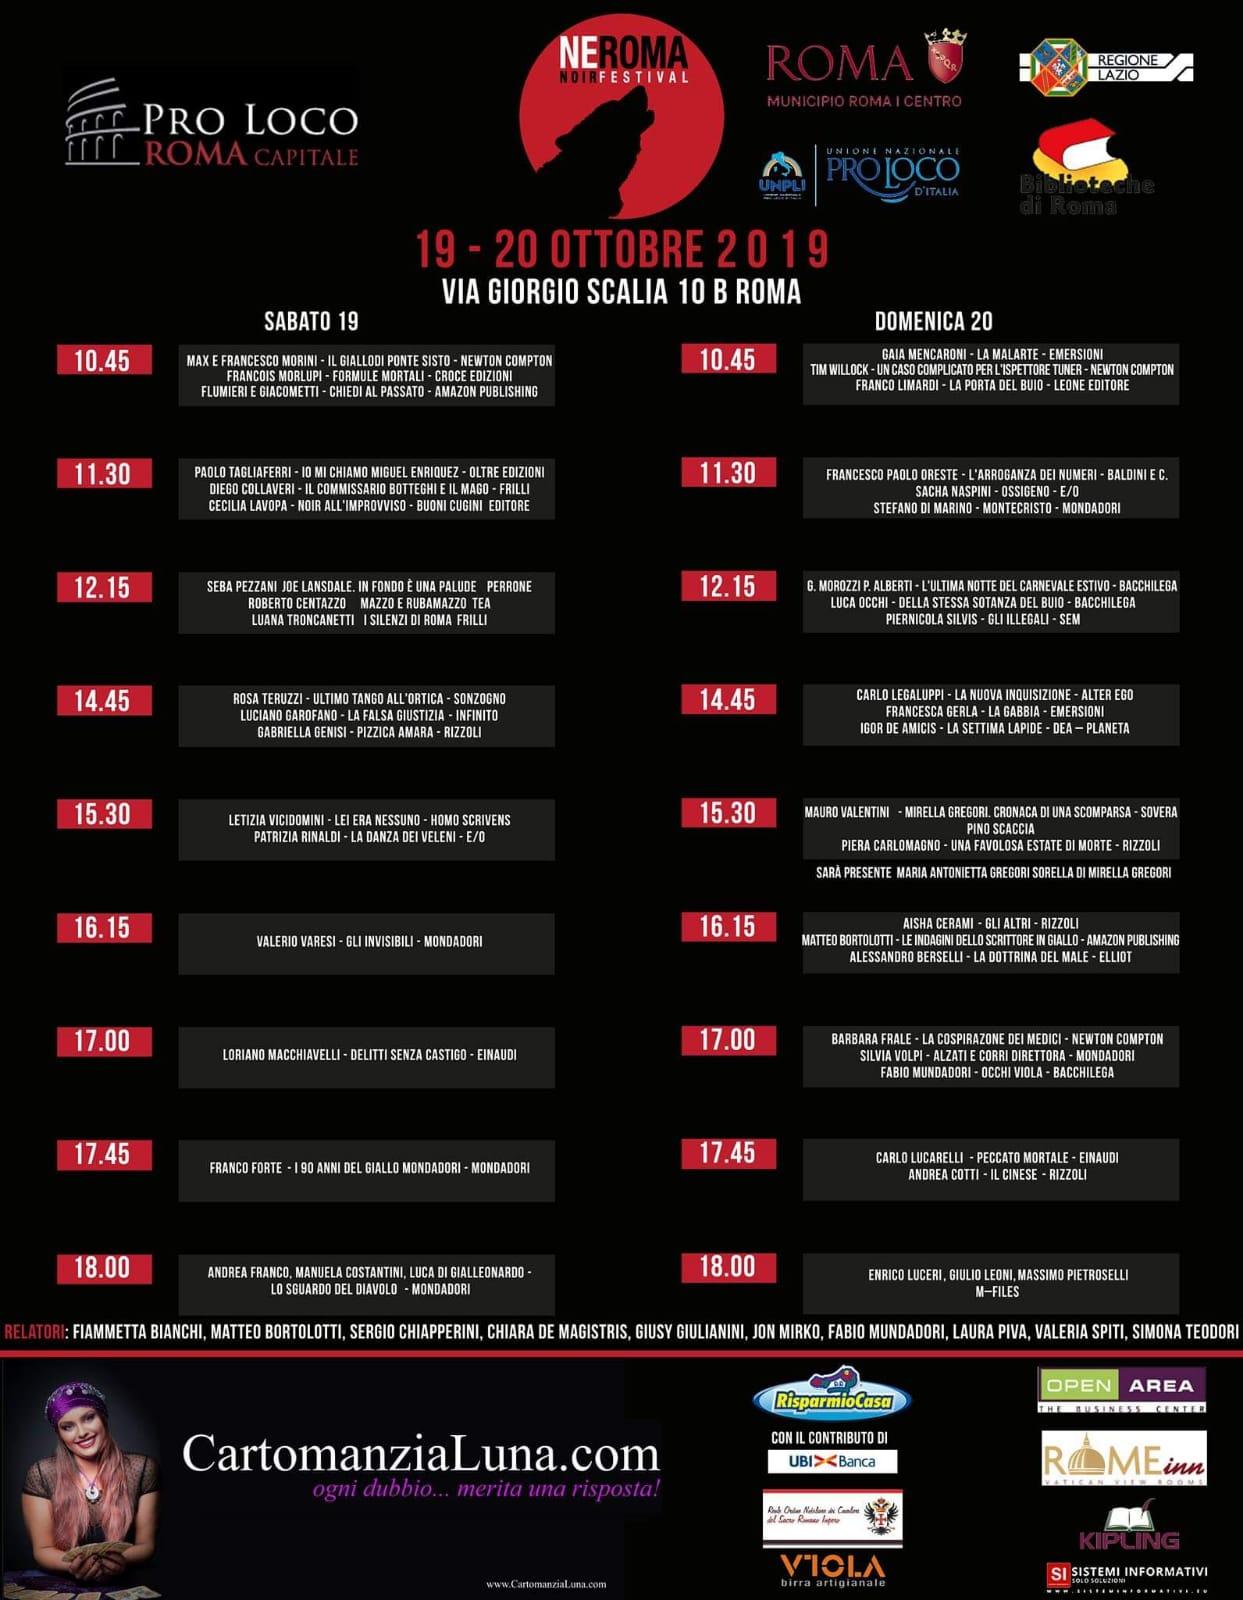 Neroma Noir Festival 2019 programma